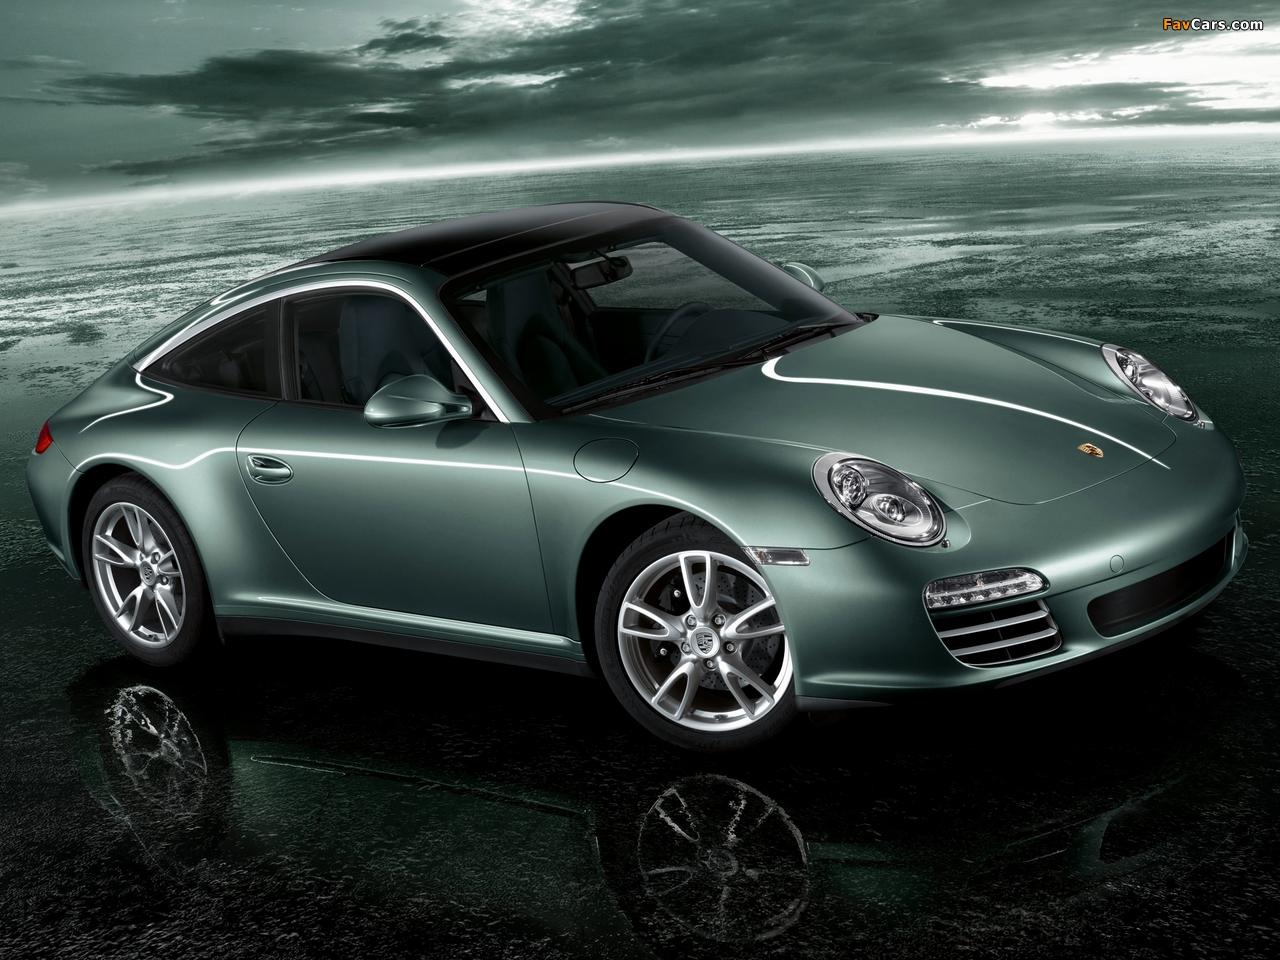 Porsche 911 Targa 4 997 2008 Images 1280x960